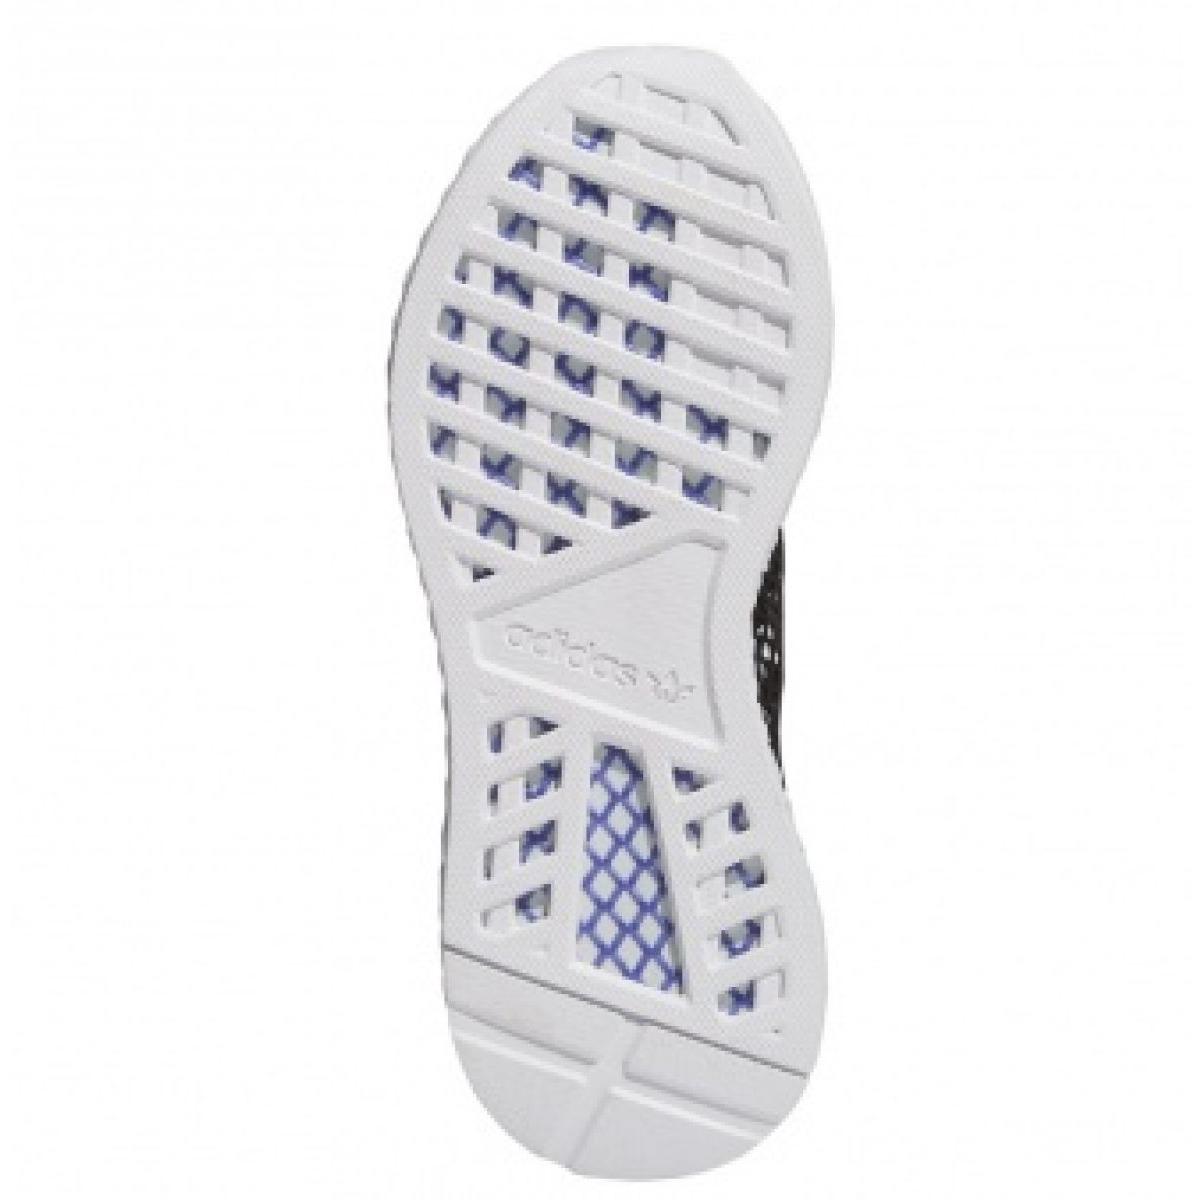 Sapatilhas Adidas Originals Deerupt Runner W EE5778 preto